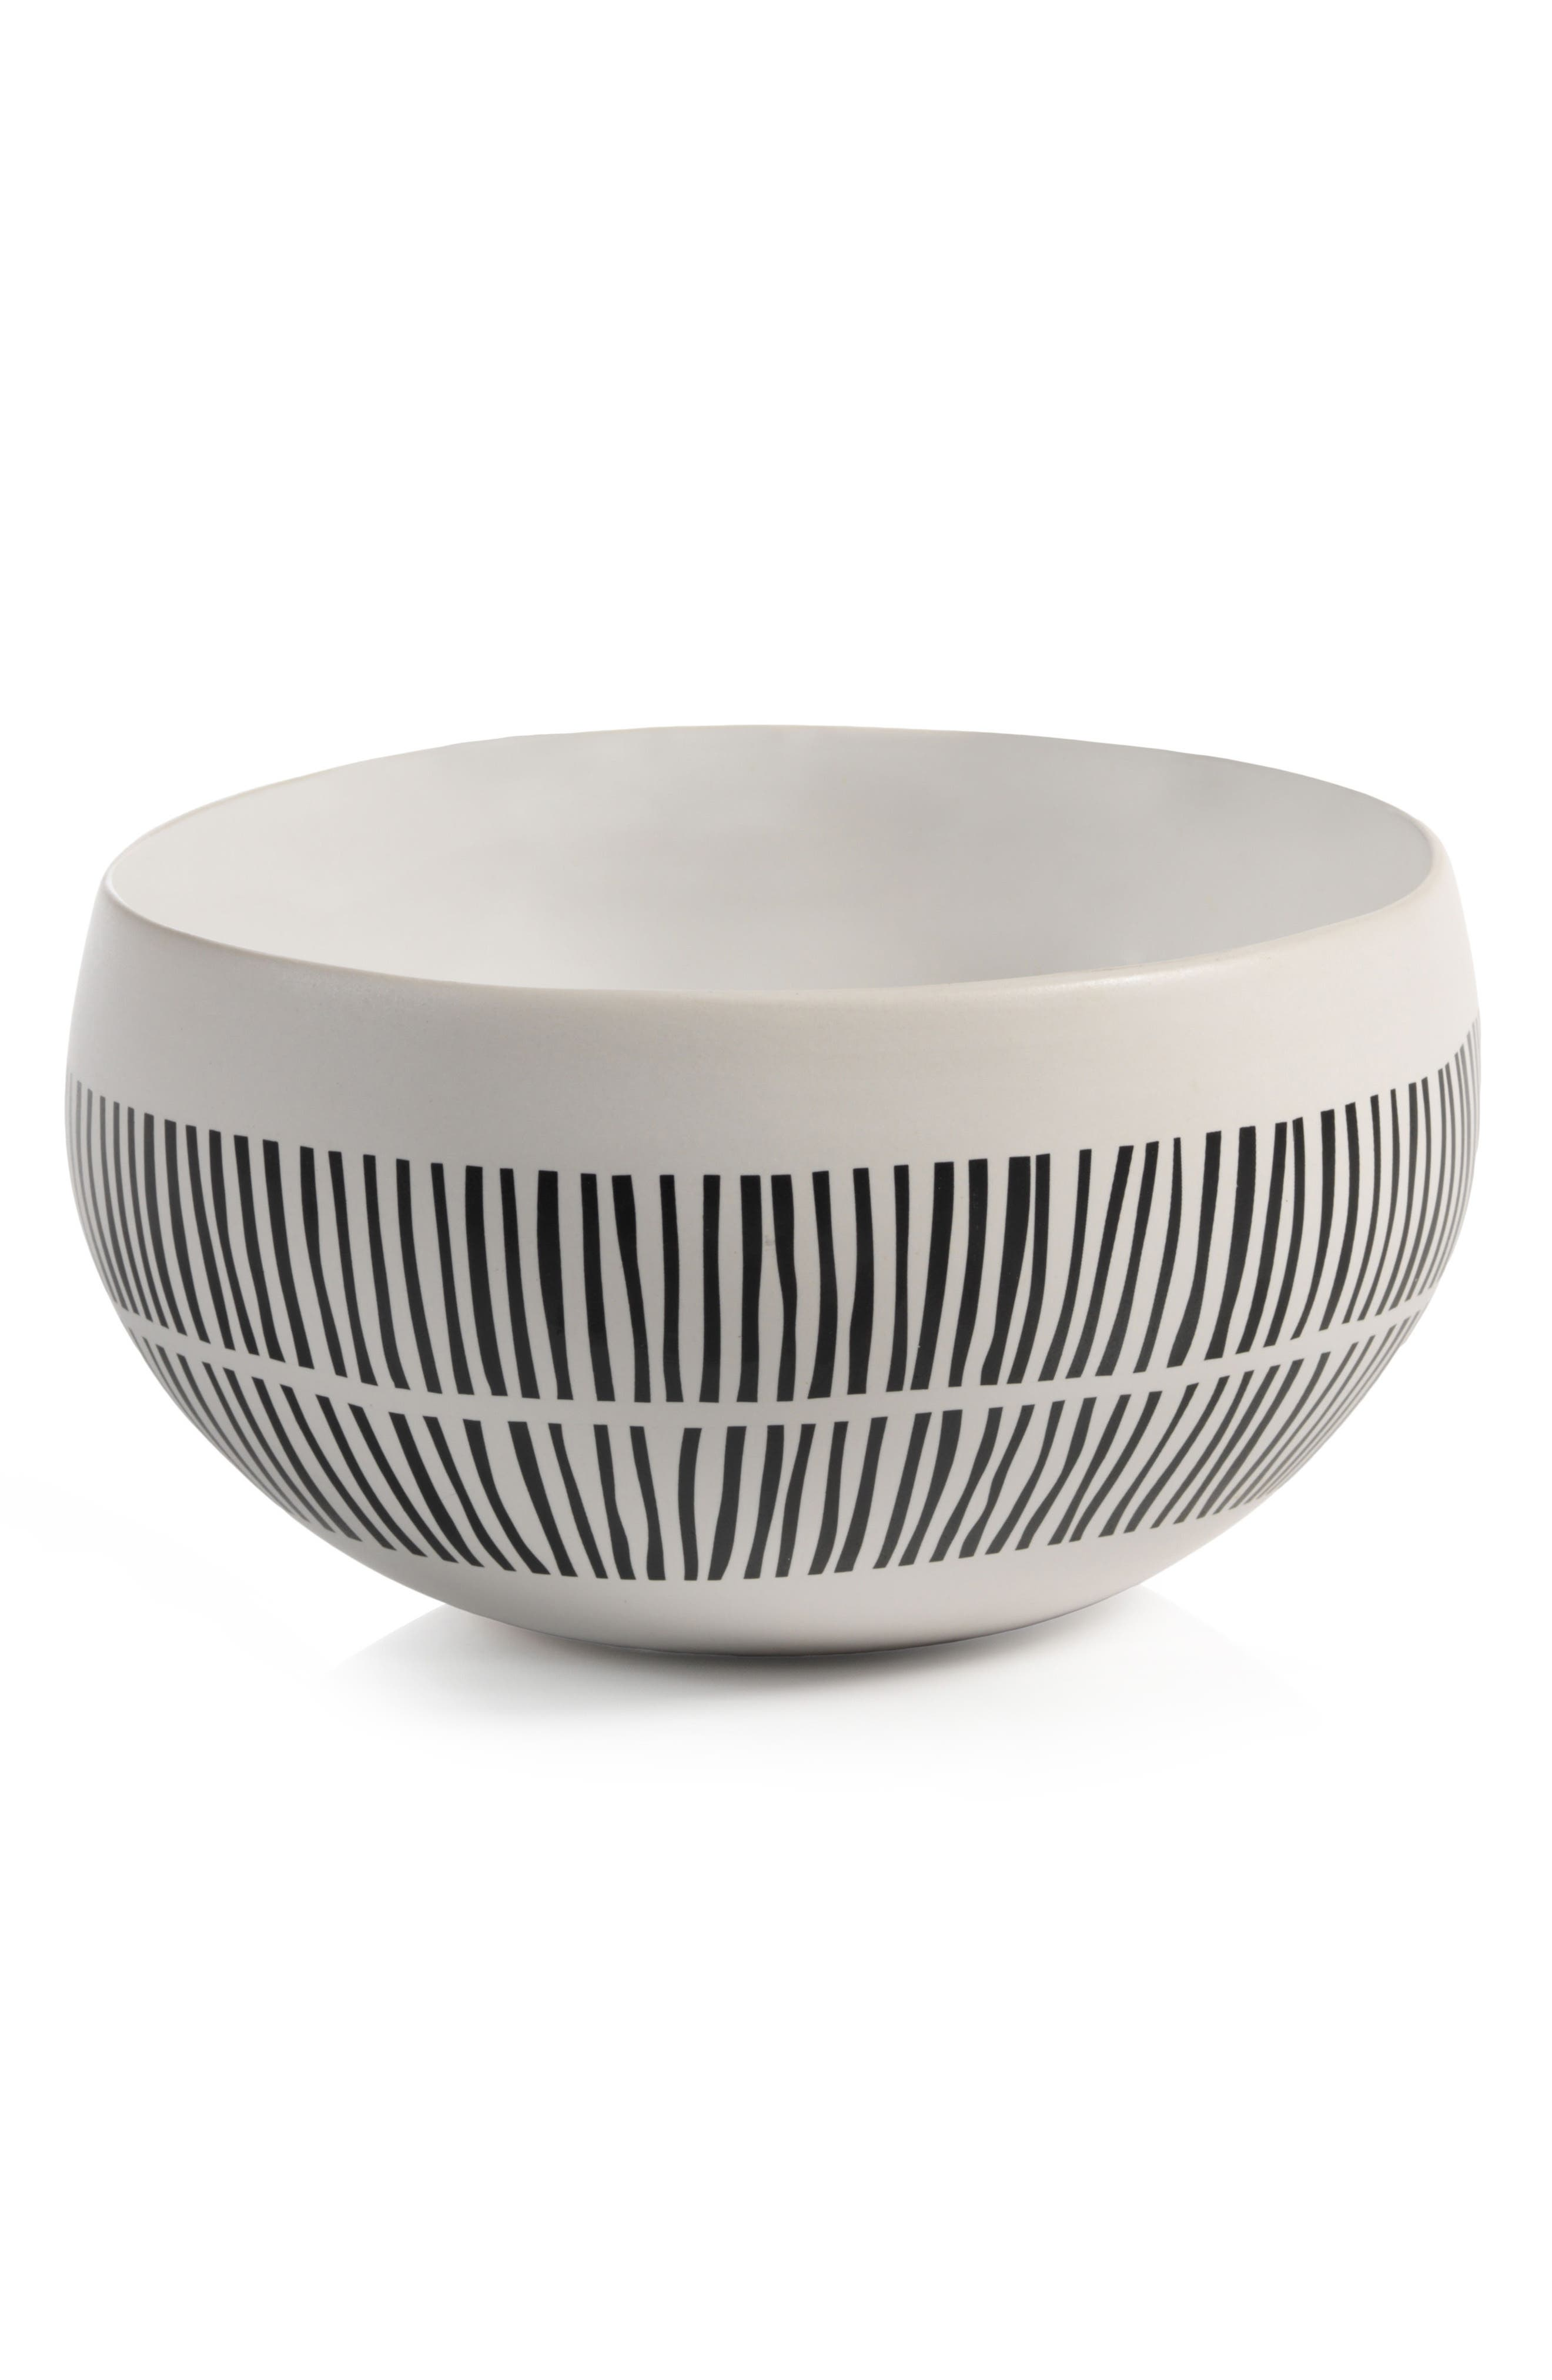 Marquesa Ceramic Bowl,                             Main thumbnail 1, color,                             100